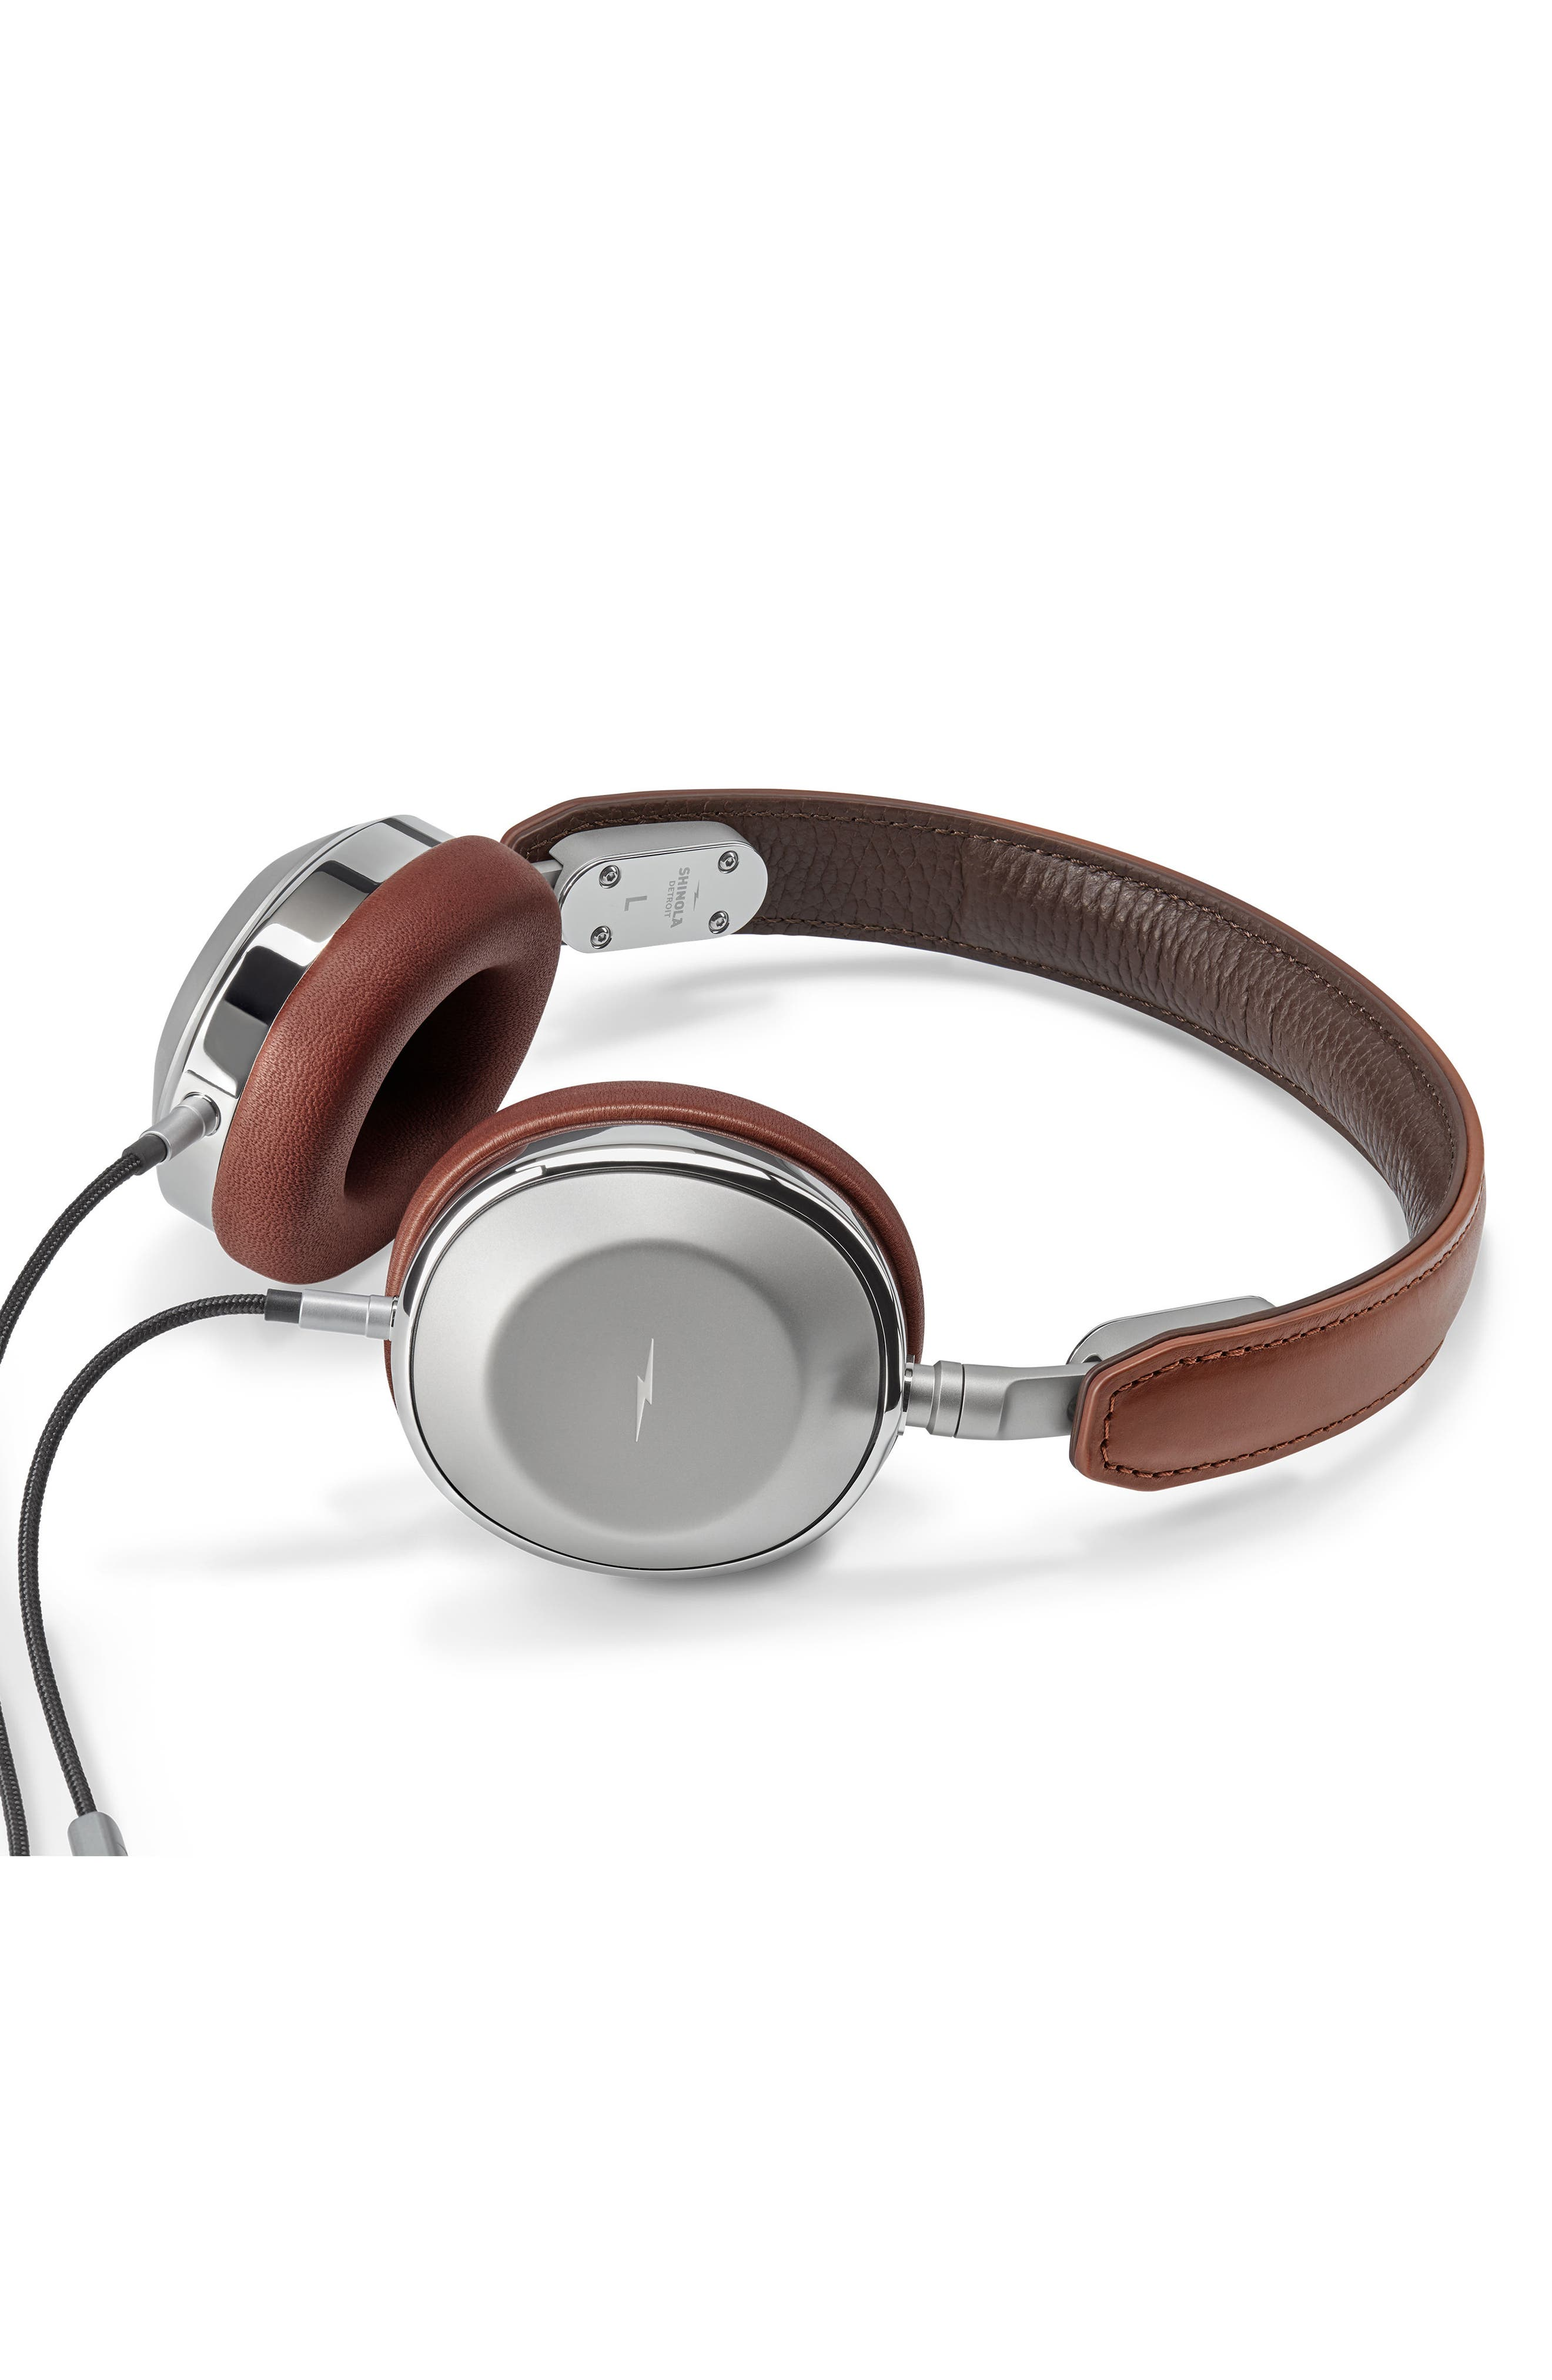 Canfield On-Ear Headphones,                             Alternate thumbnail 2, color,                             Cognac